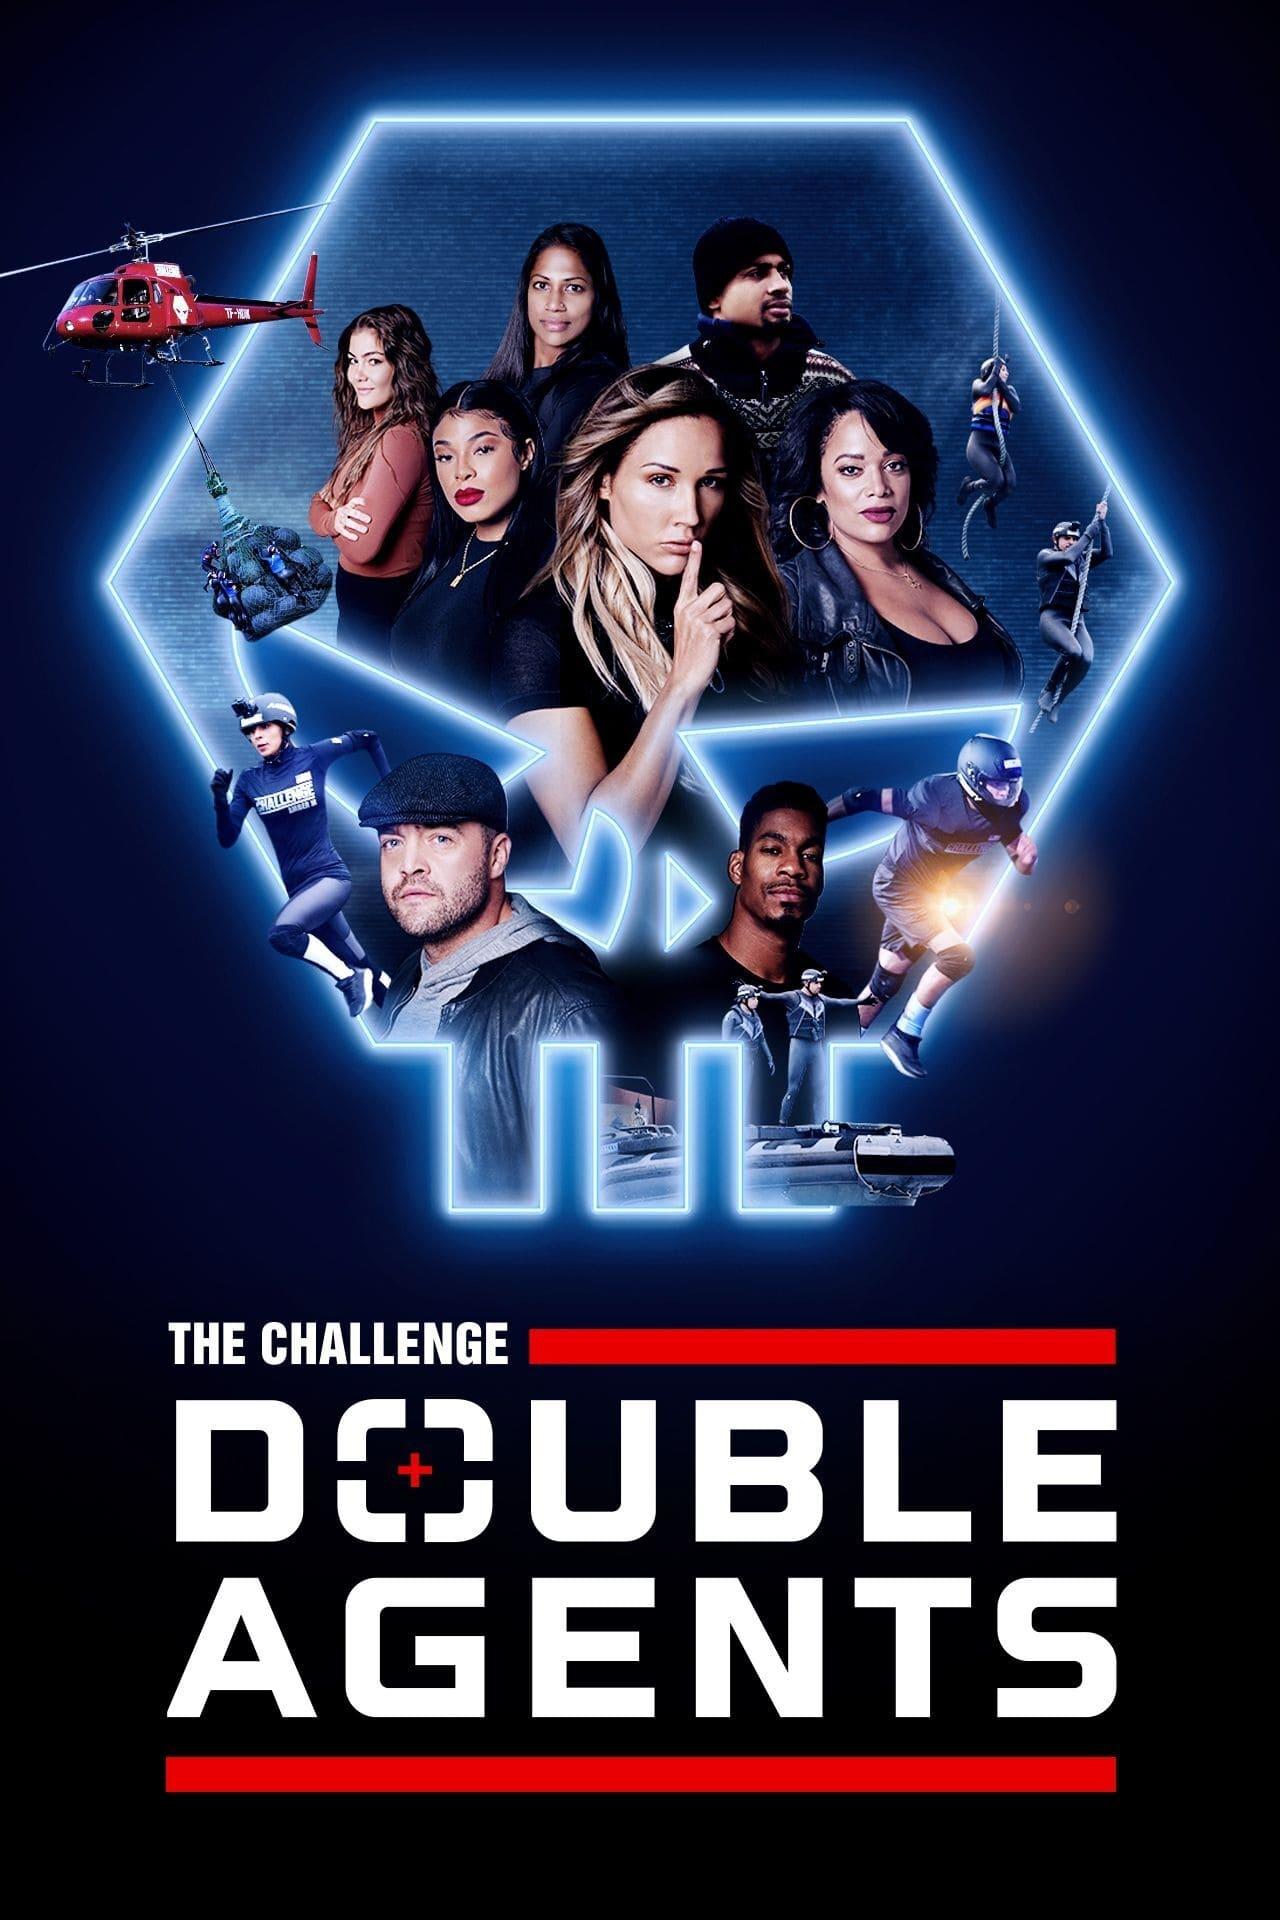 The Challenge Season 36